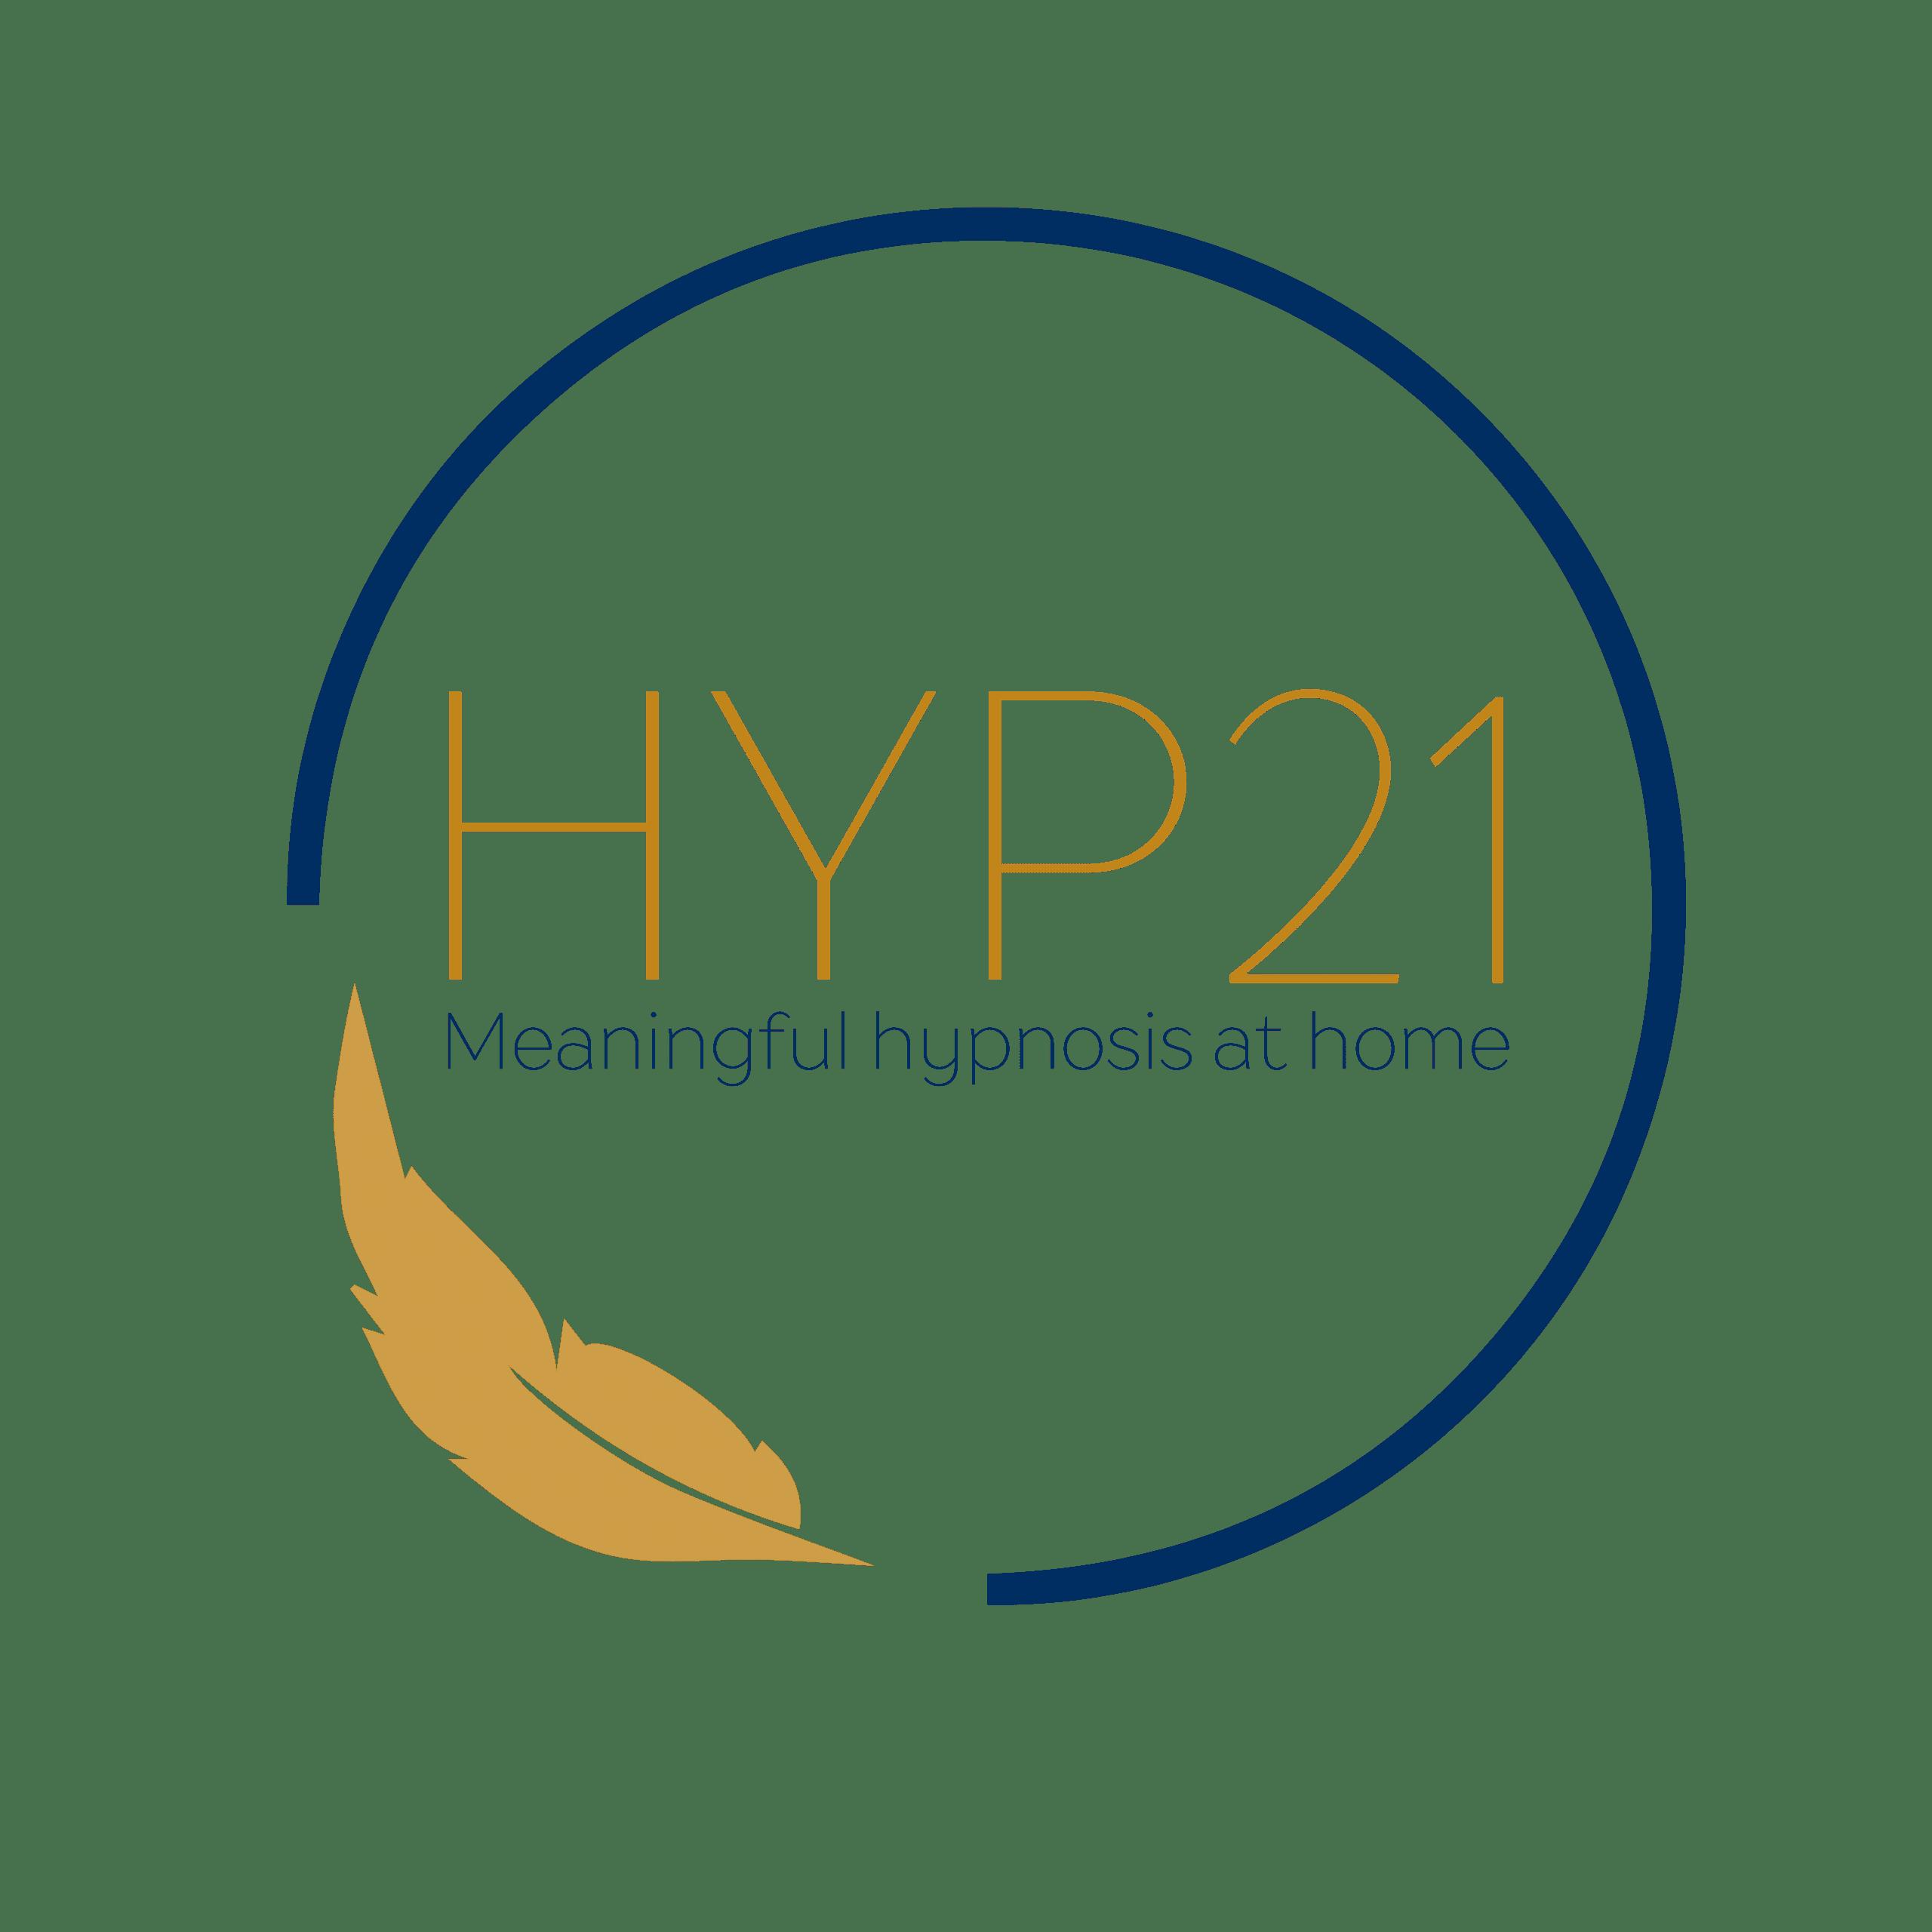 final hyp21 logo-01